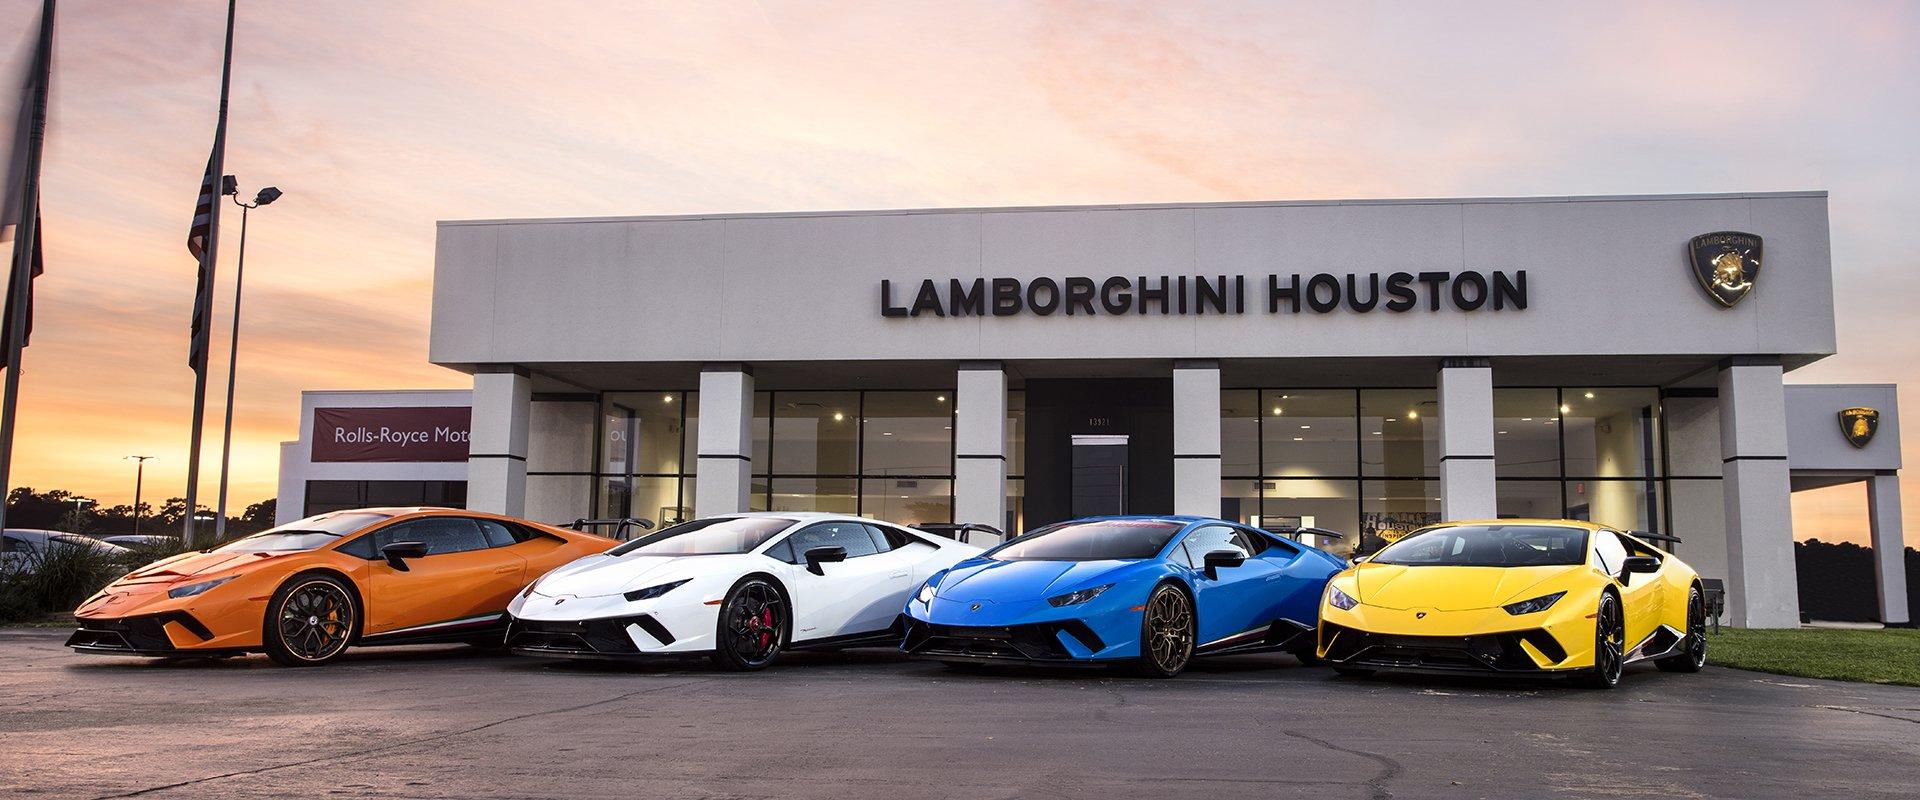 Lamborghini registers 11% Growth in First Half of 2018 - GaadiKey